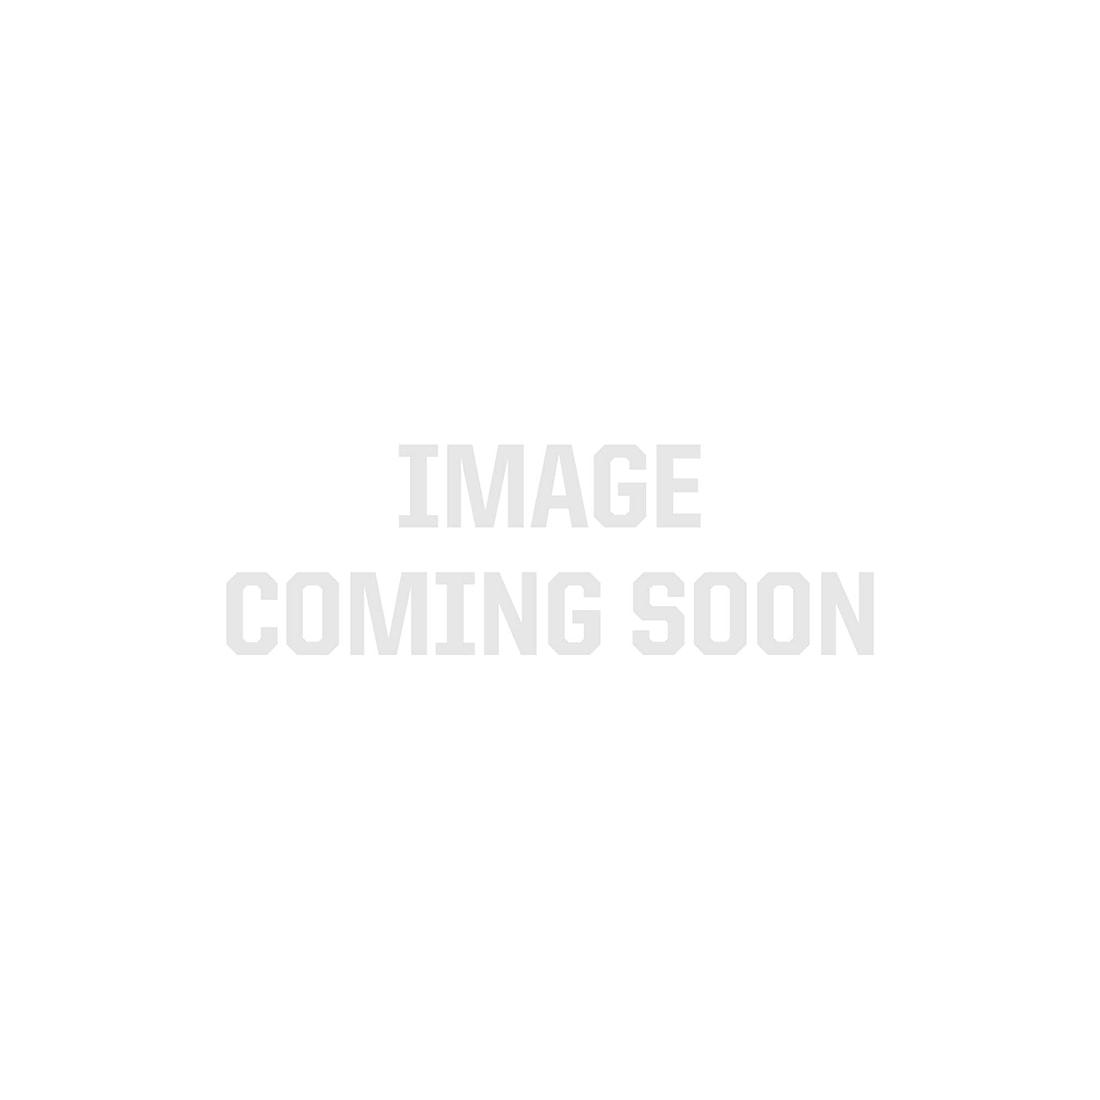 Lutron PICO-WBX-ADAPT wireless control wallbox adapter